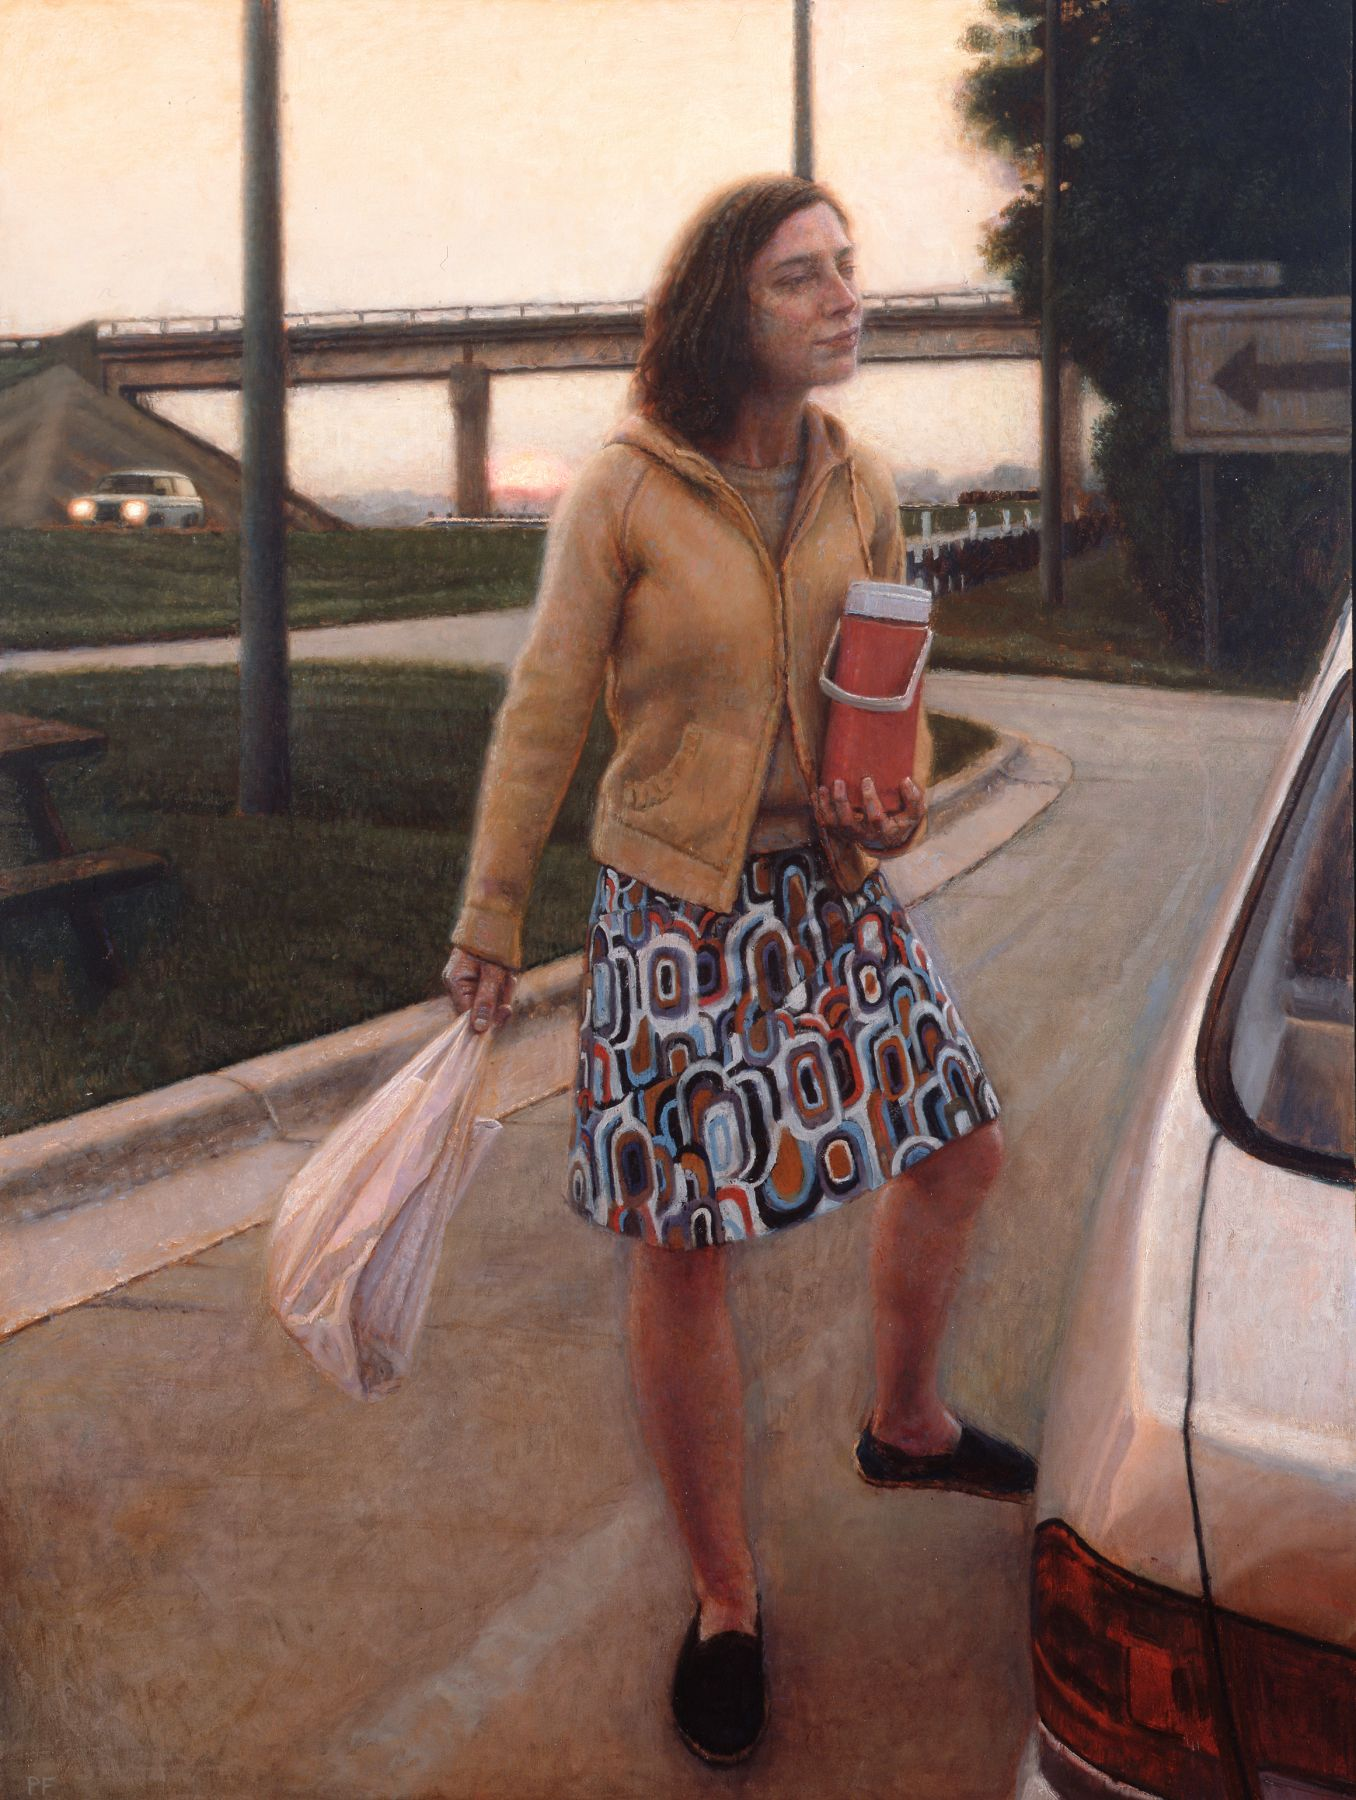 Paul Fenniak, Lay-By (SOLD), 2007, oil on canvas, 48 x 36 inches